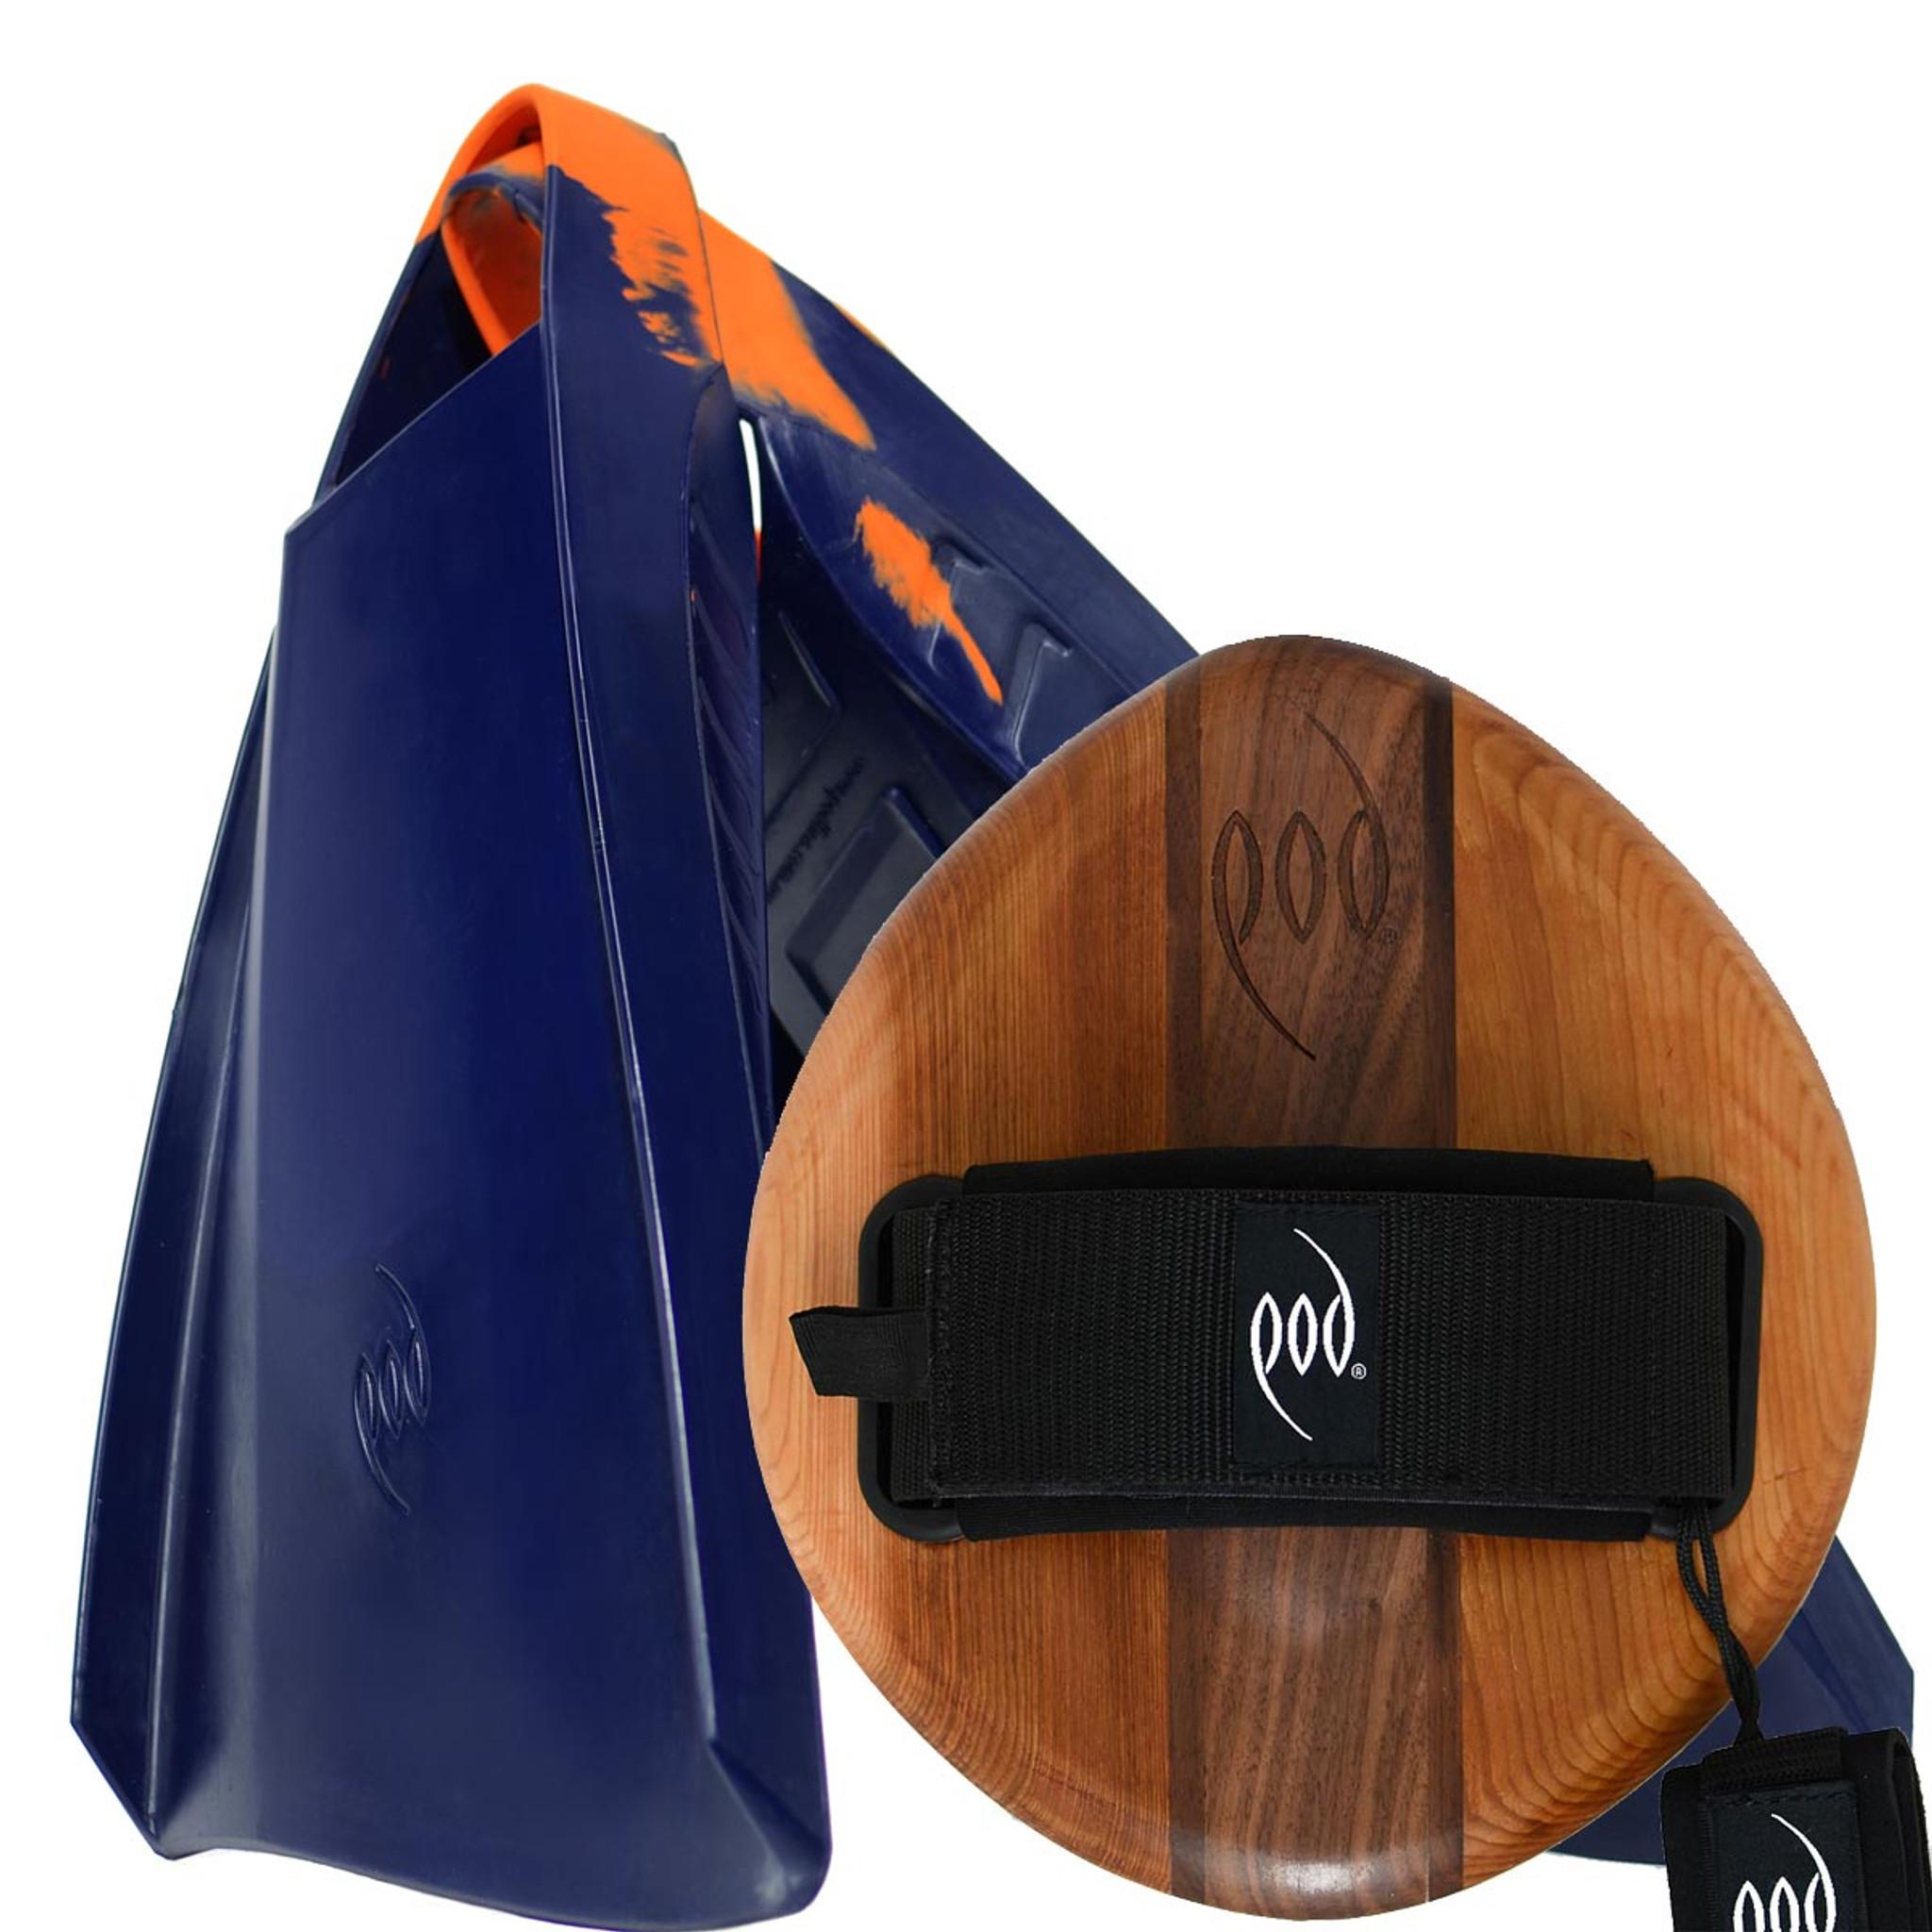 EGO Wood POD Handboard PF3 Swim Fins - Best Bodysurfing Gear